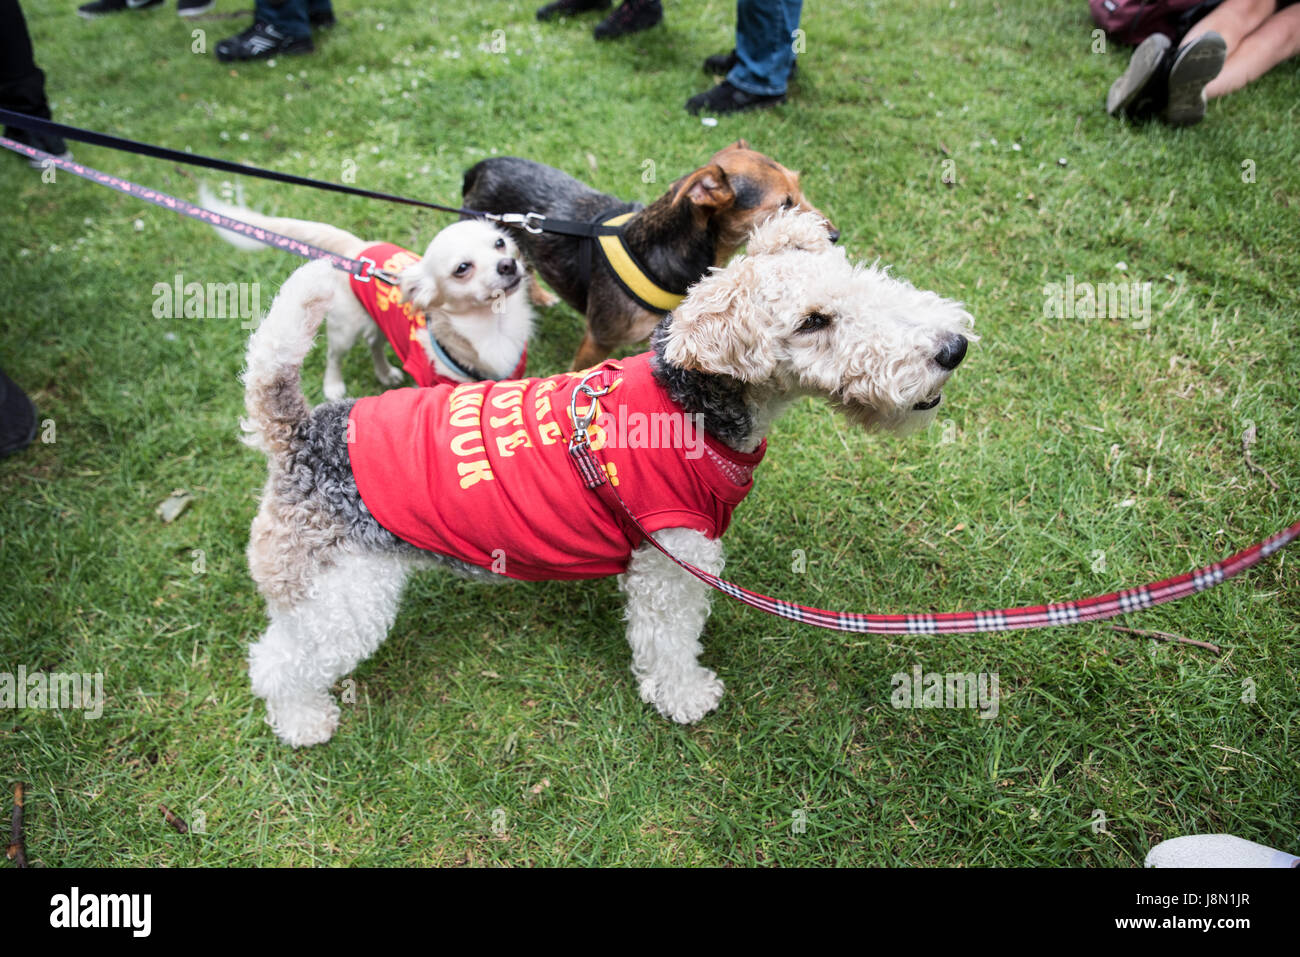 Anti-Fox-Hunting march 29th May 2017 London - dogs are wearing an anti fox hunting costume Credit Anja Riedmann/Alamy Live News & London UK. 29th May 2017. Anti-Fox-Hunting march 29th May 2017 ...